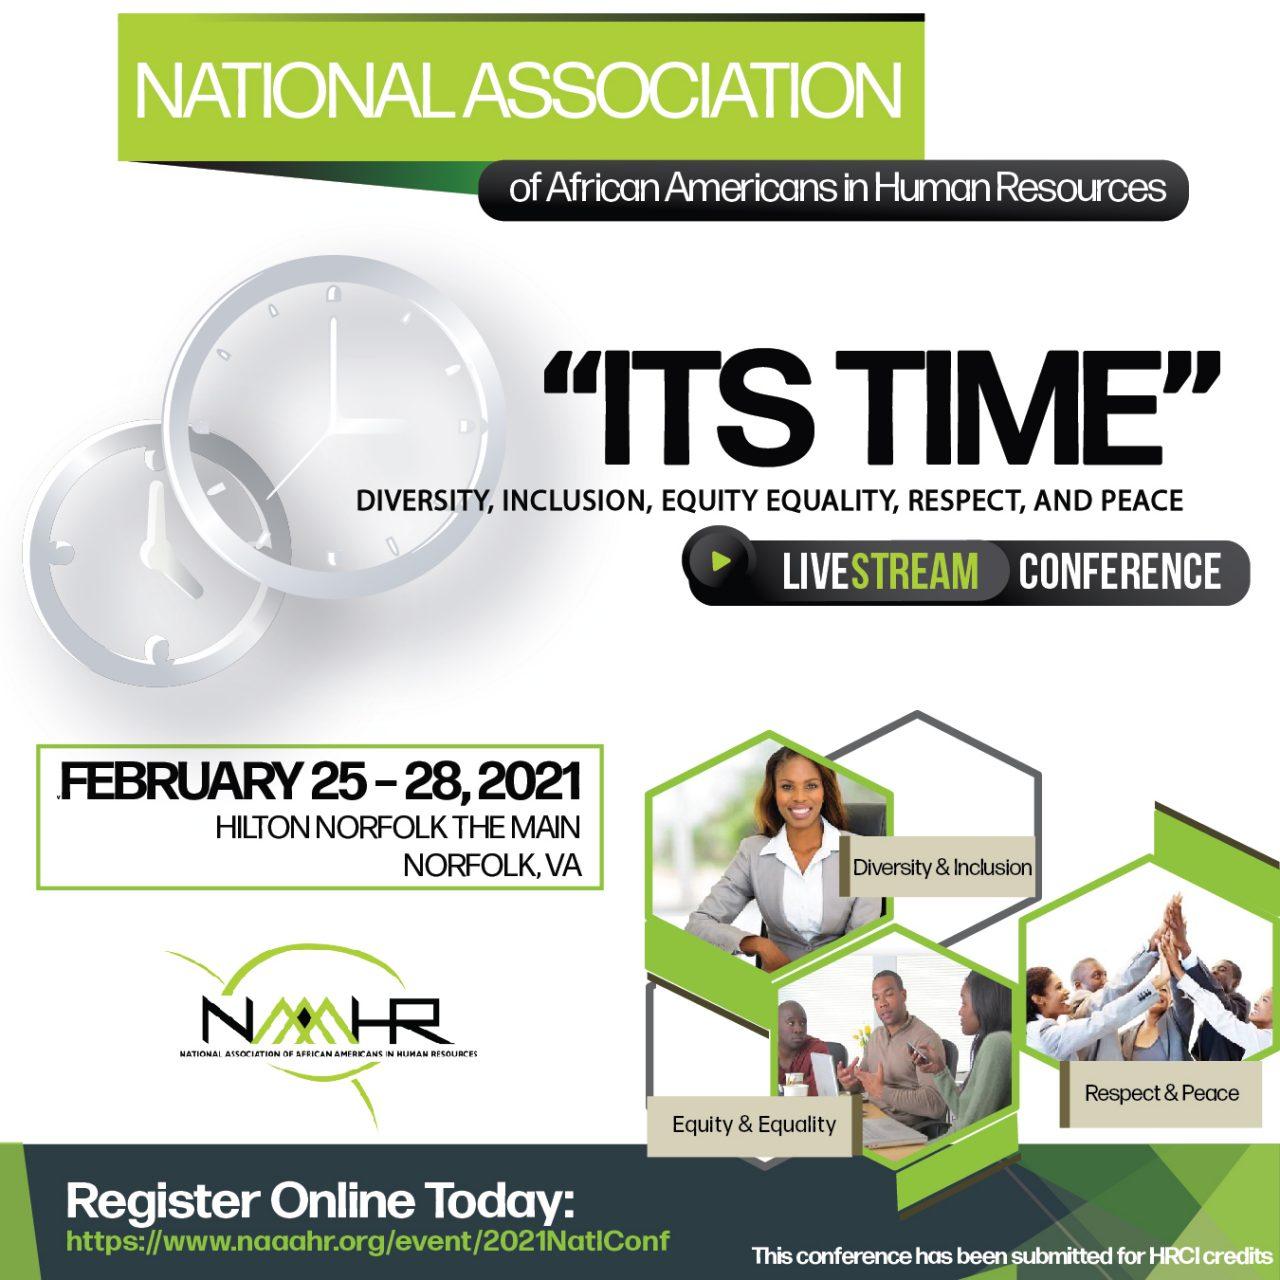 https://naaahrrva.org/wp-content/uploads/2021/01/NAAAHR-2021-Conference-1280x1280.jpg